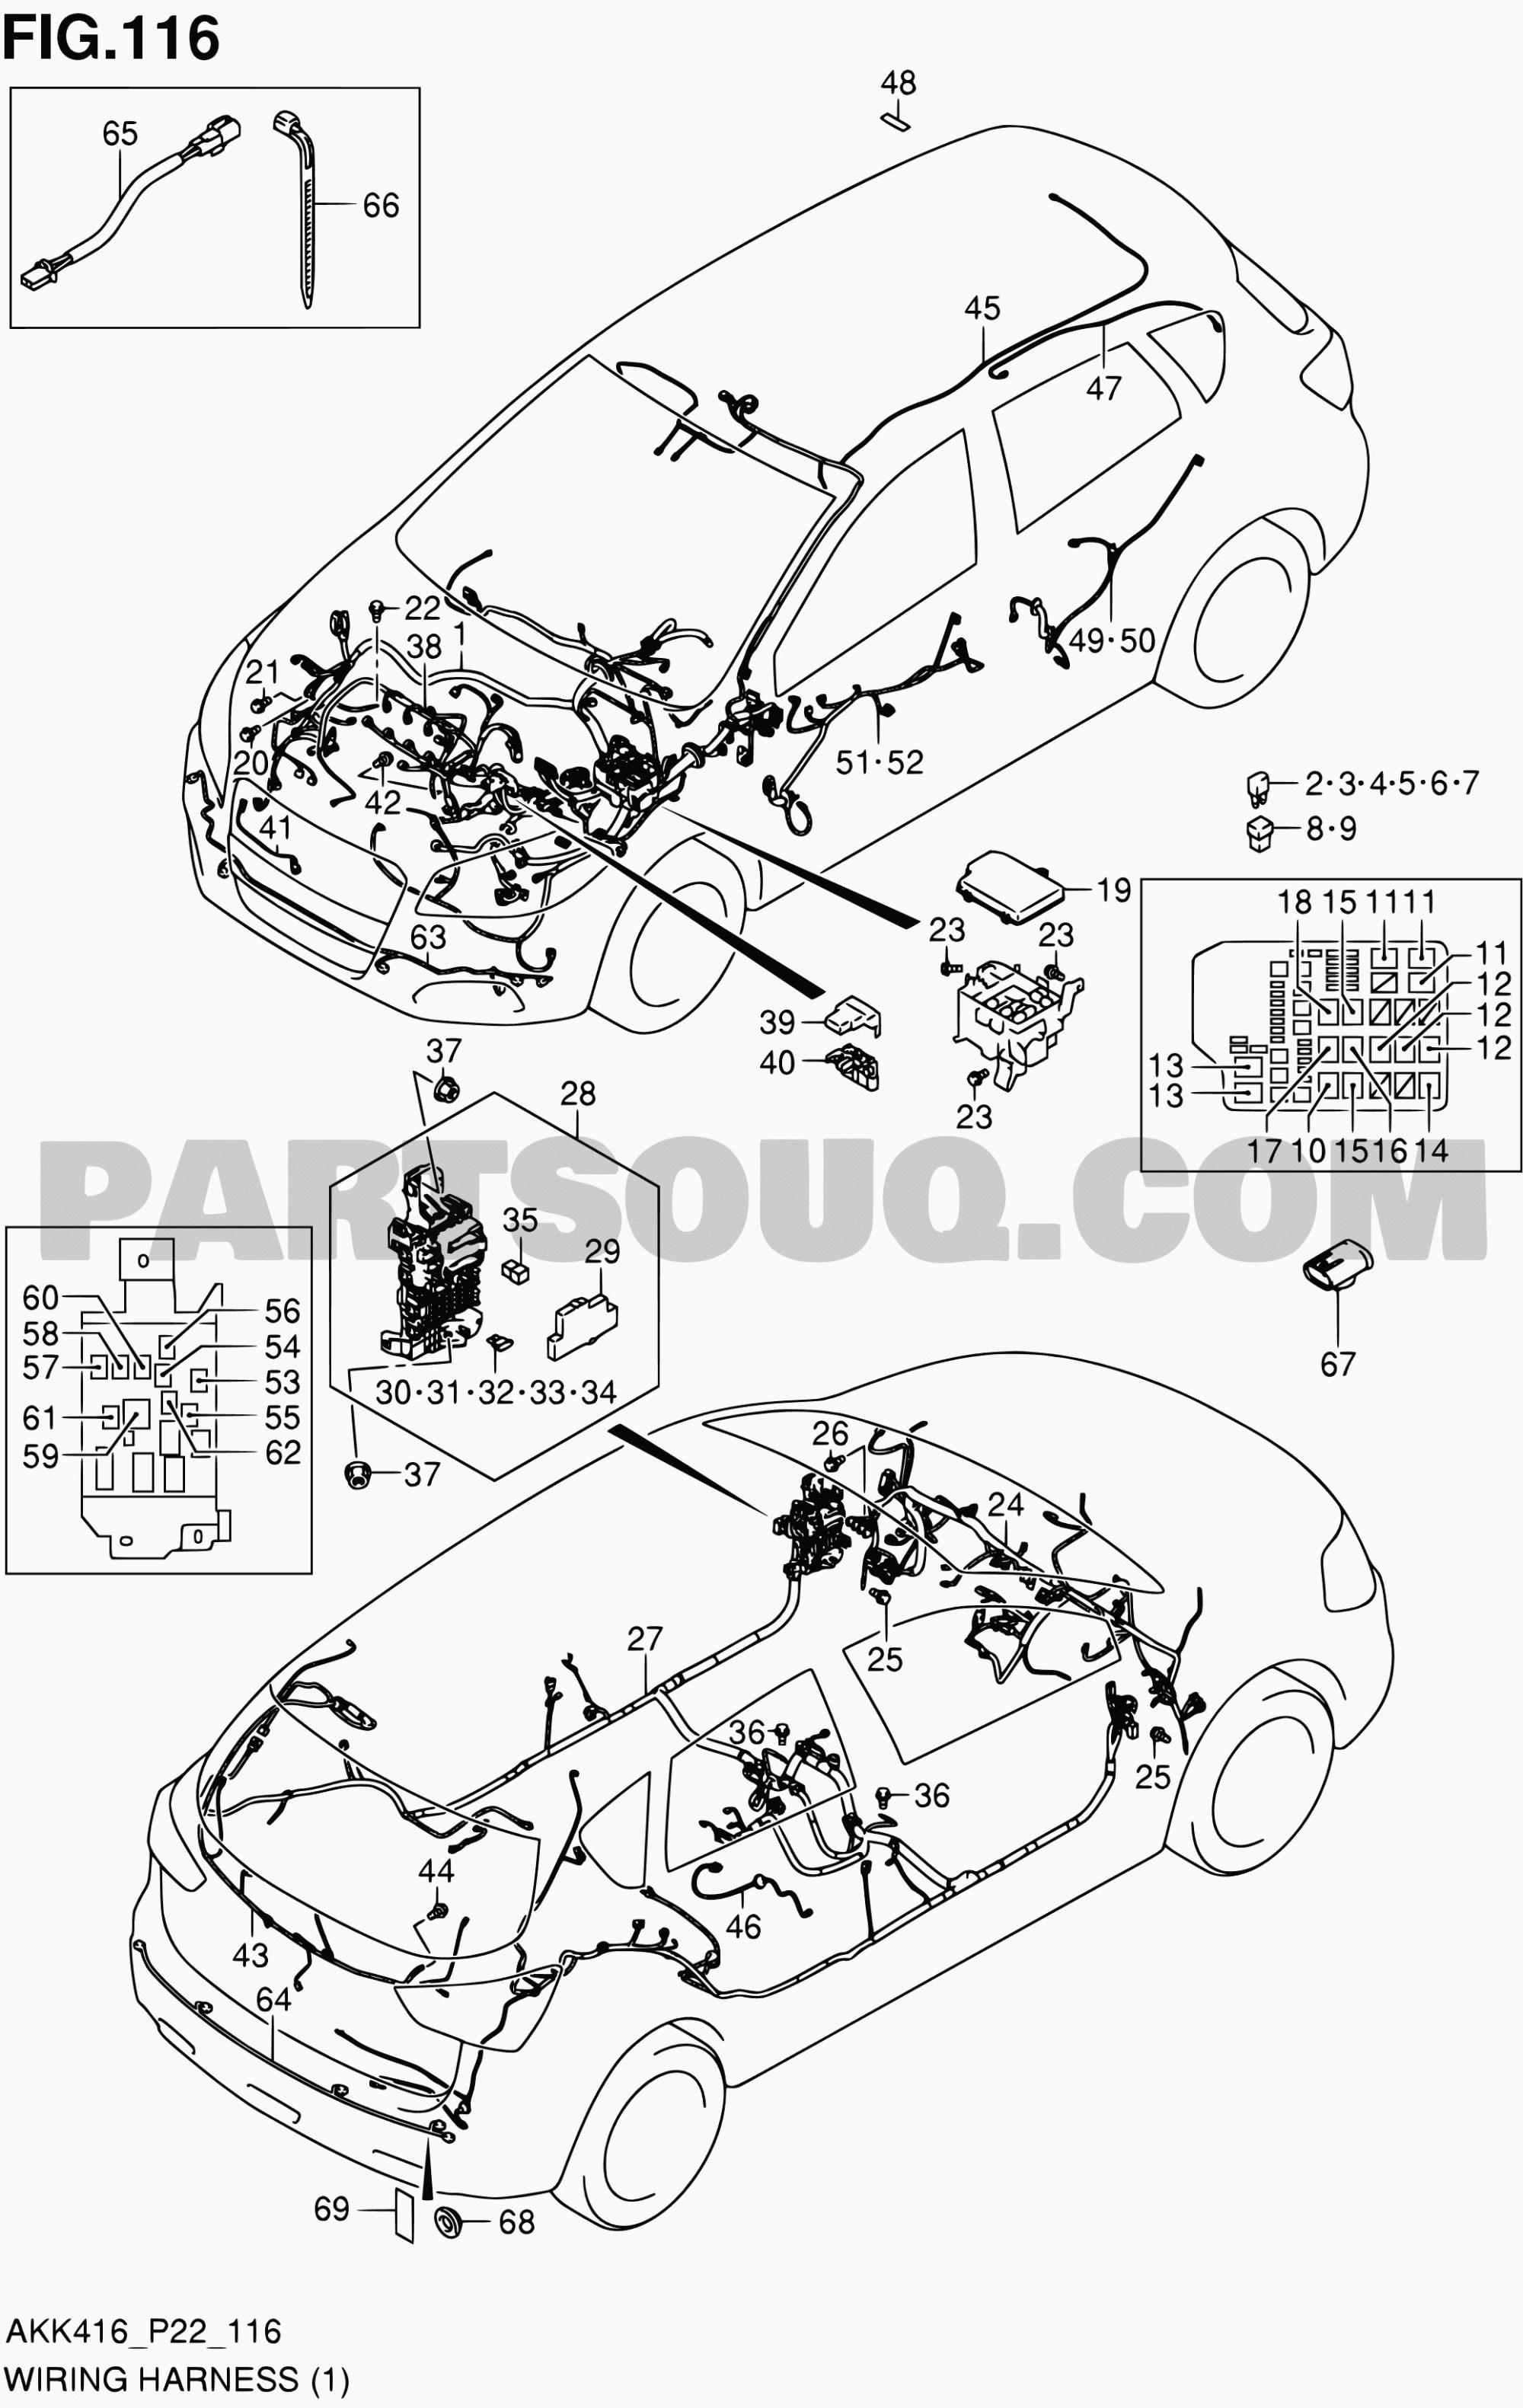 hight resolution of 2000 mitsubishi montero sport 3 0 engine diagram 2000